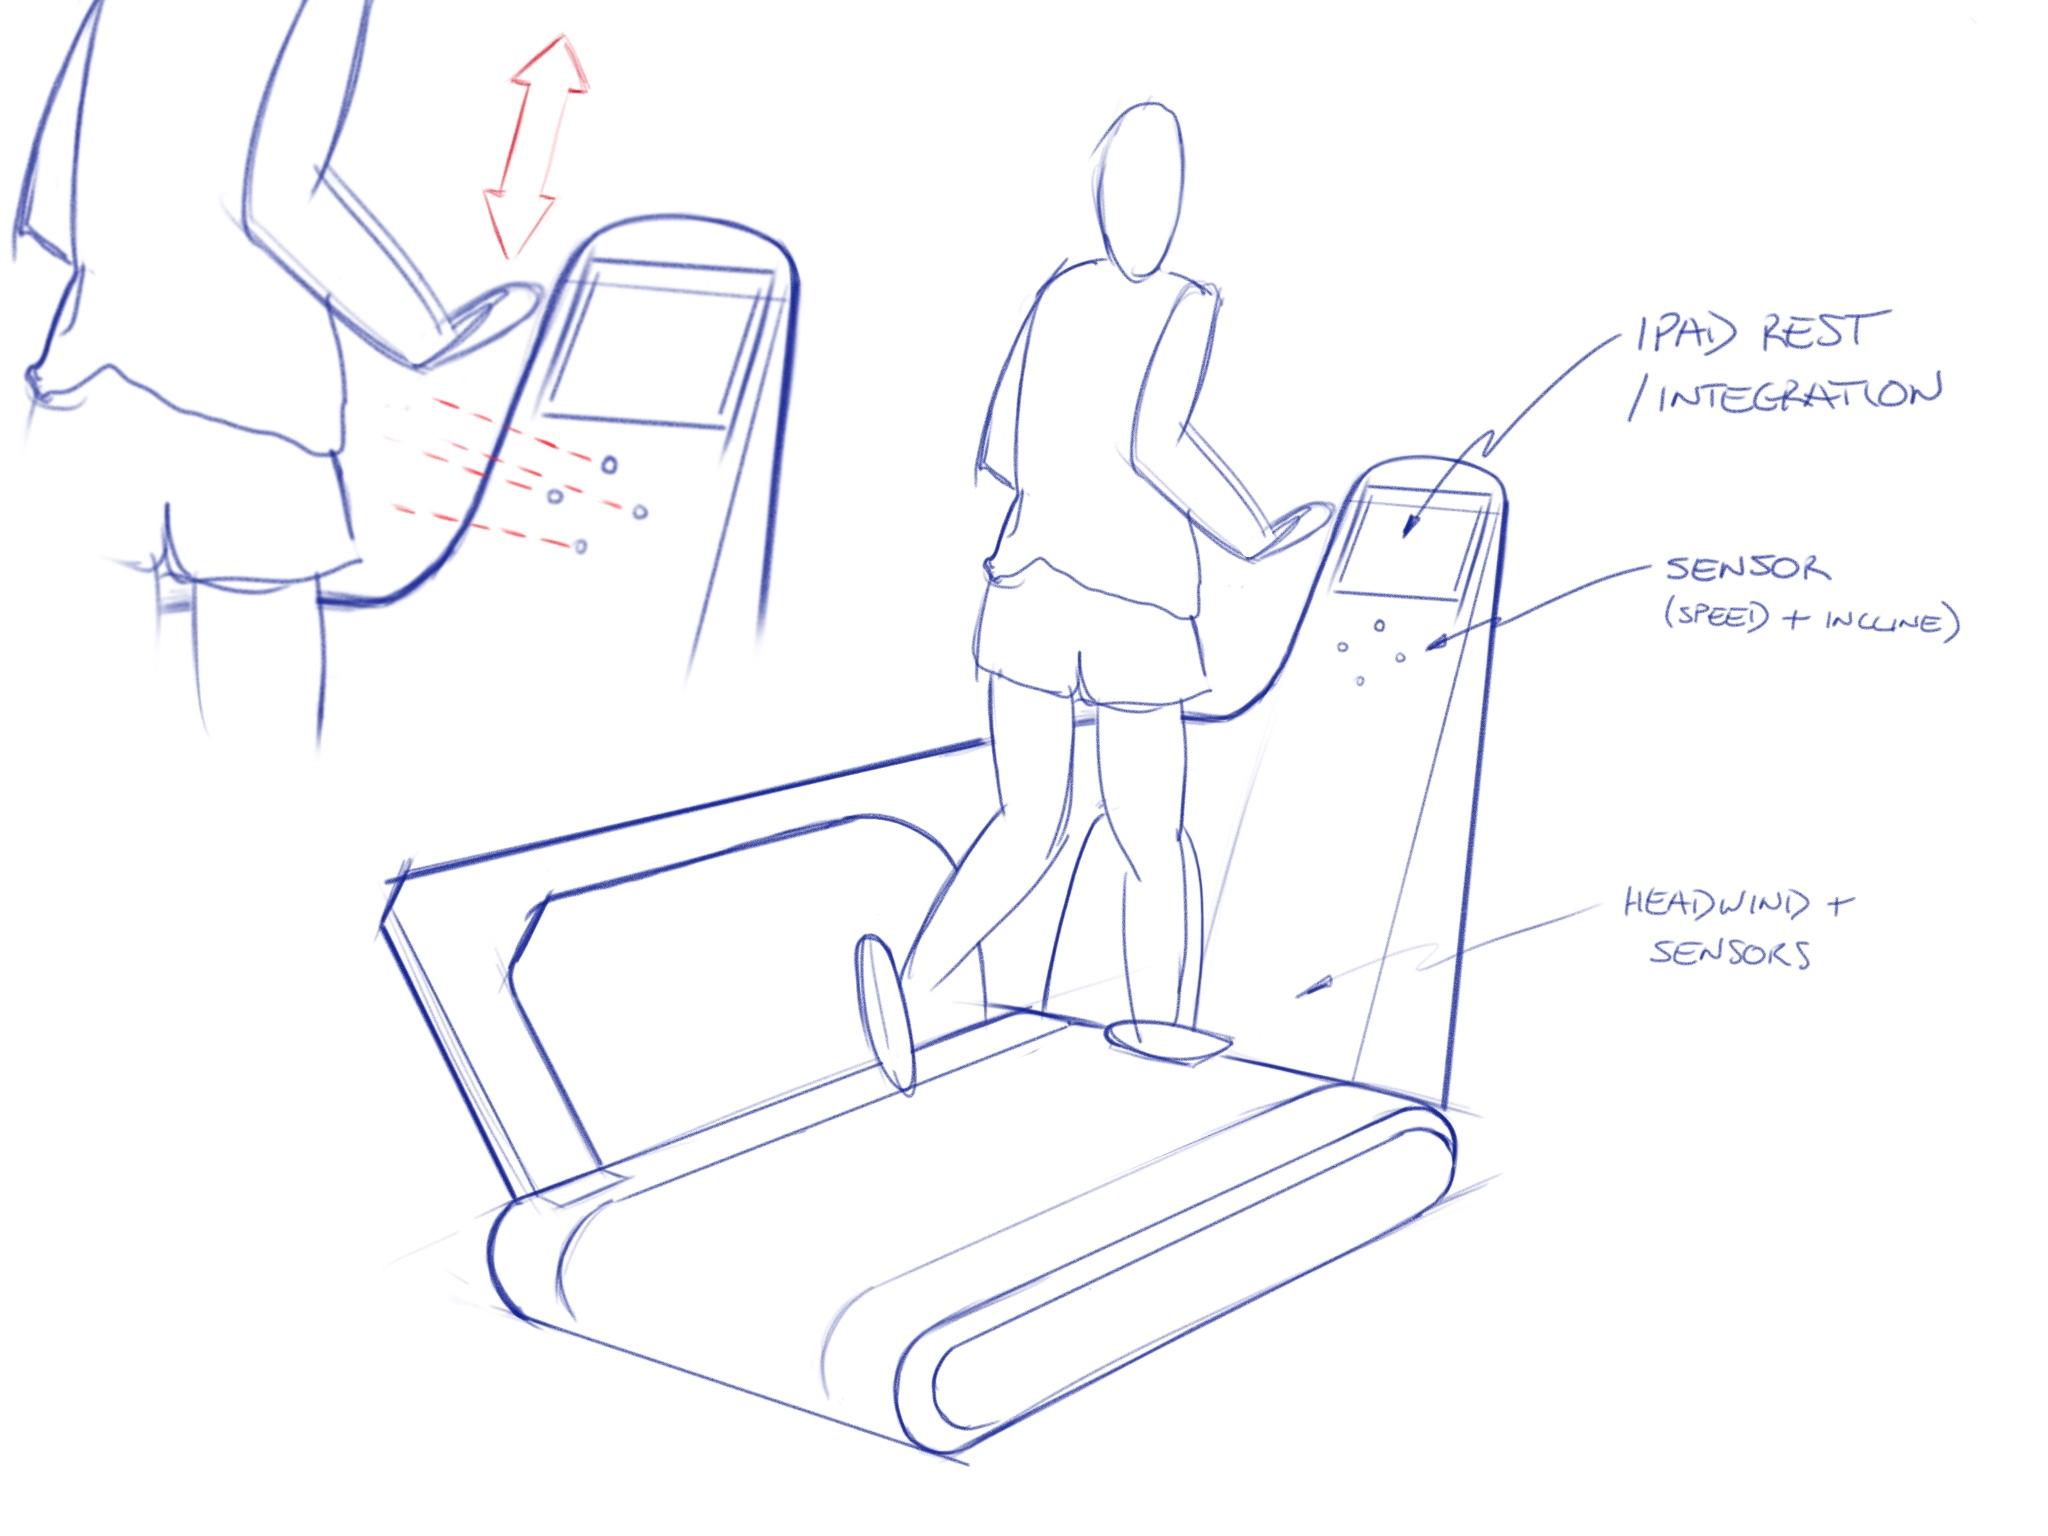 Treadmill_Round_1a